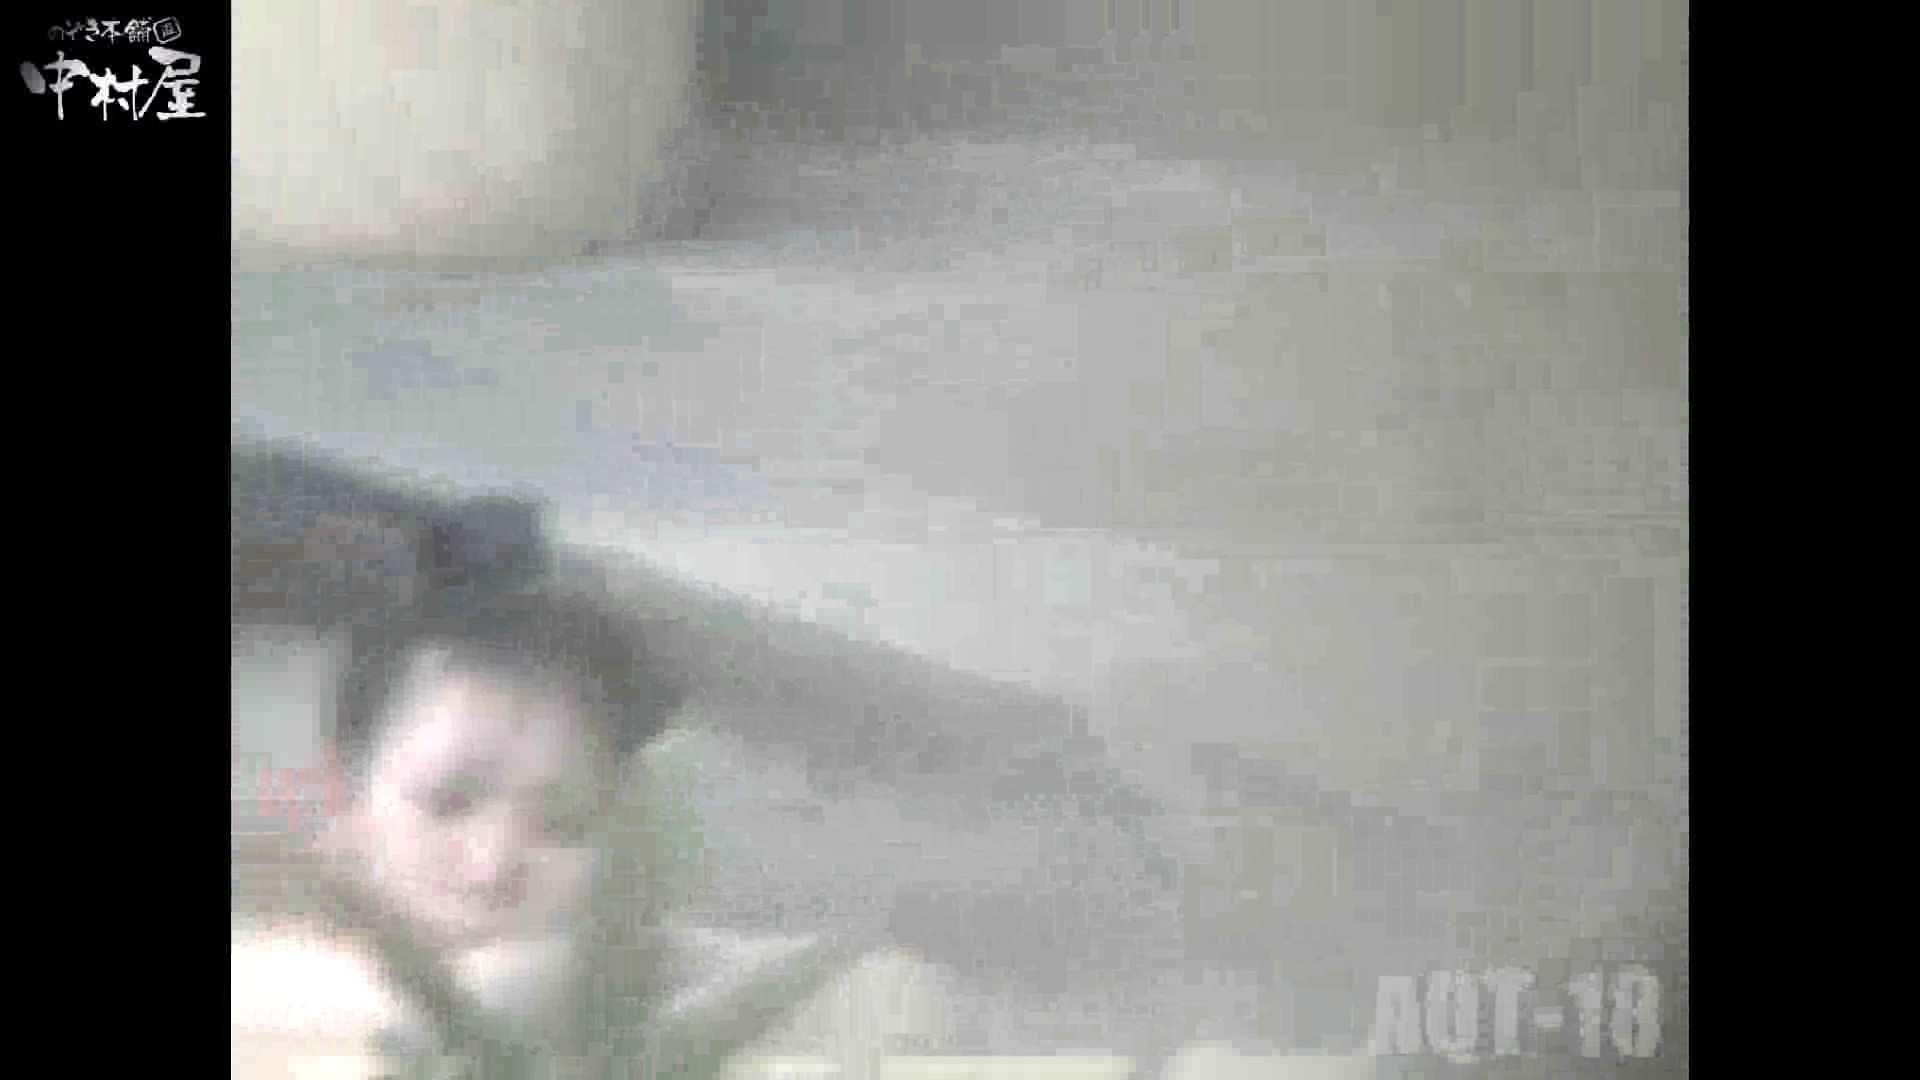 Aquaな露天風呂Vol.882潜入盗撮露天風呂十八判湯 其の二 潜入 おめこ無修正動画無料 90画像 67